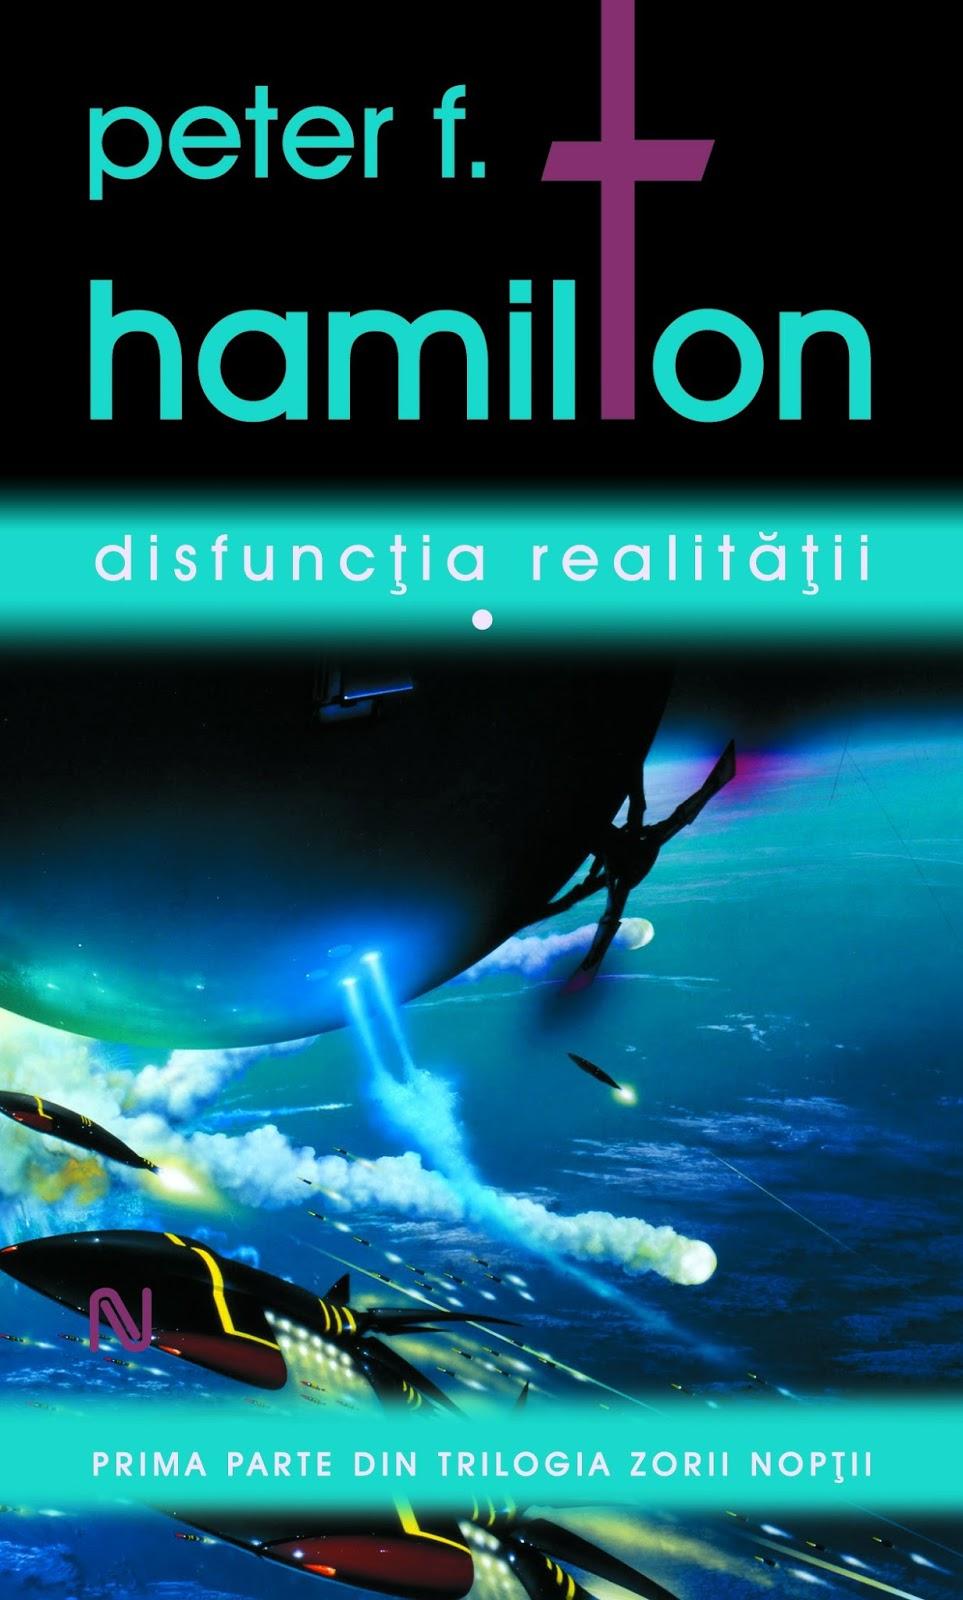 Peter F. Hamilton - Disfunctia Realitatii